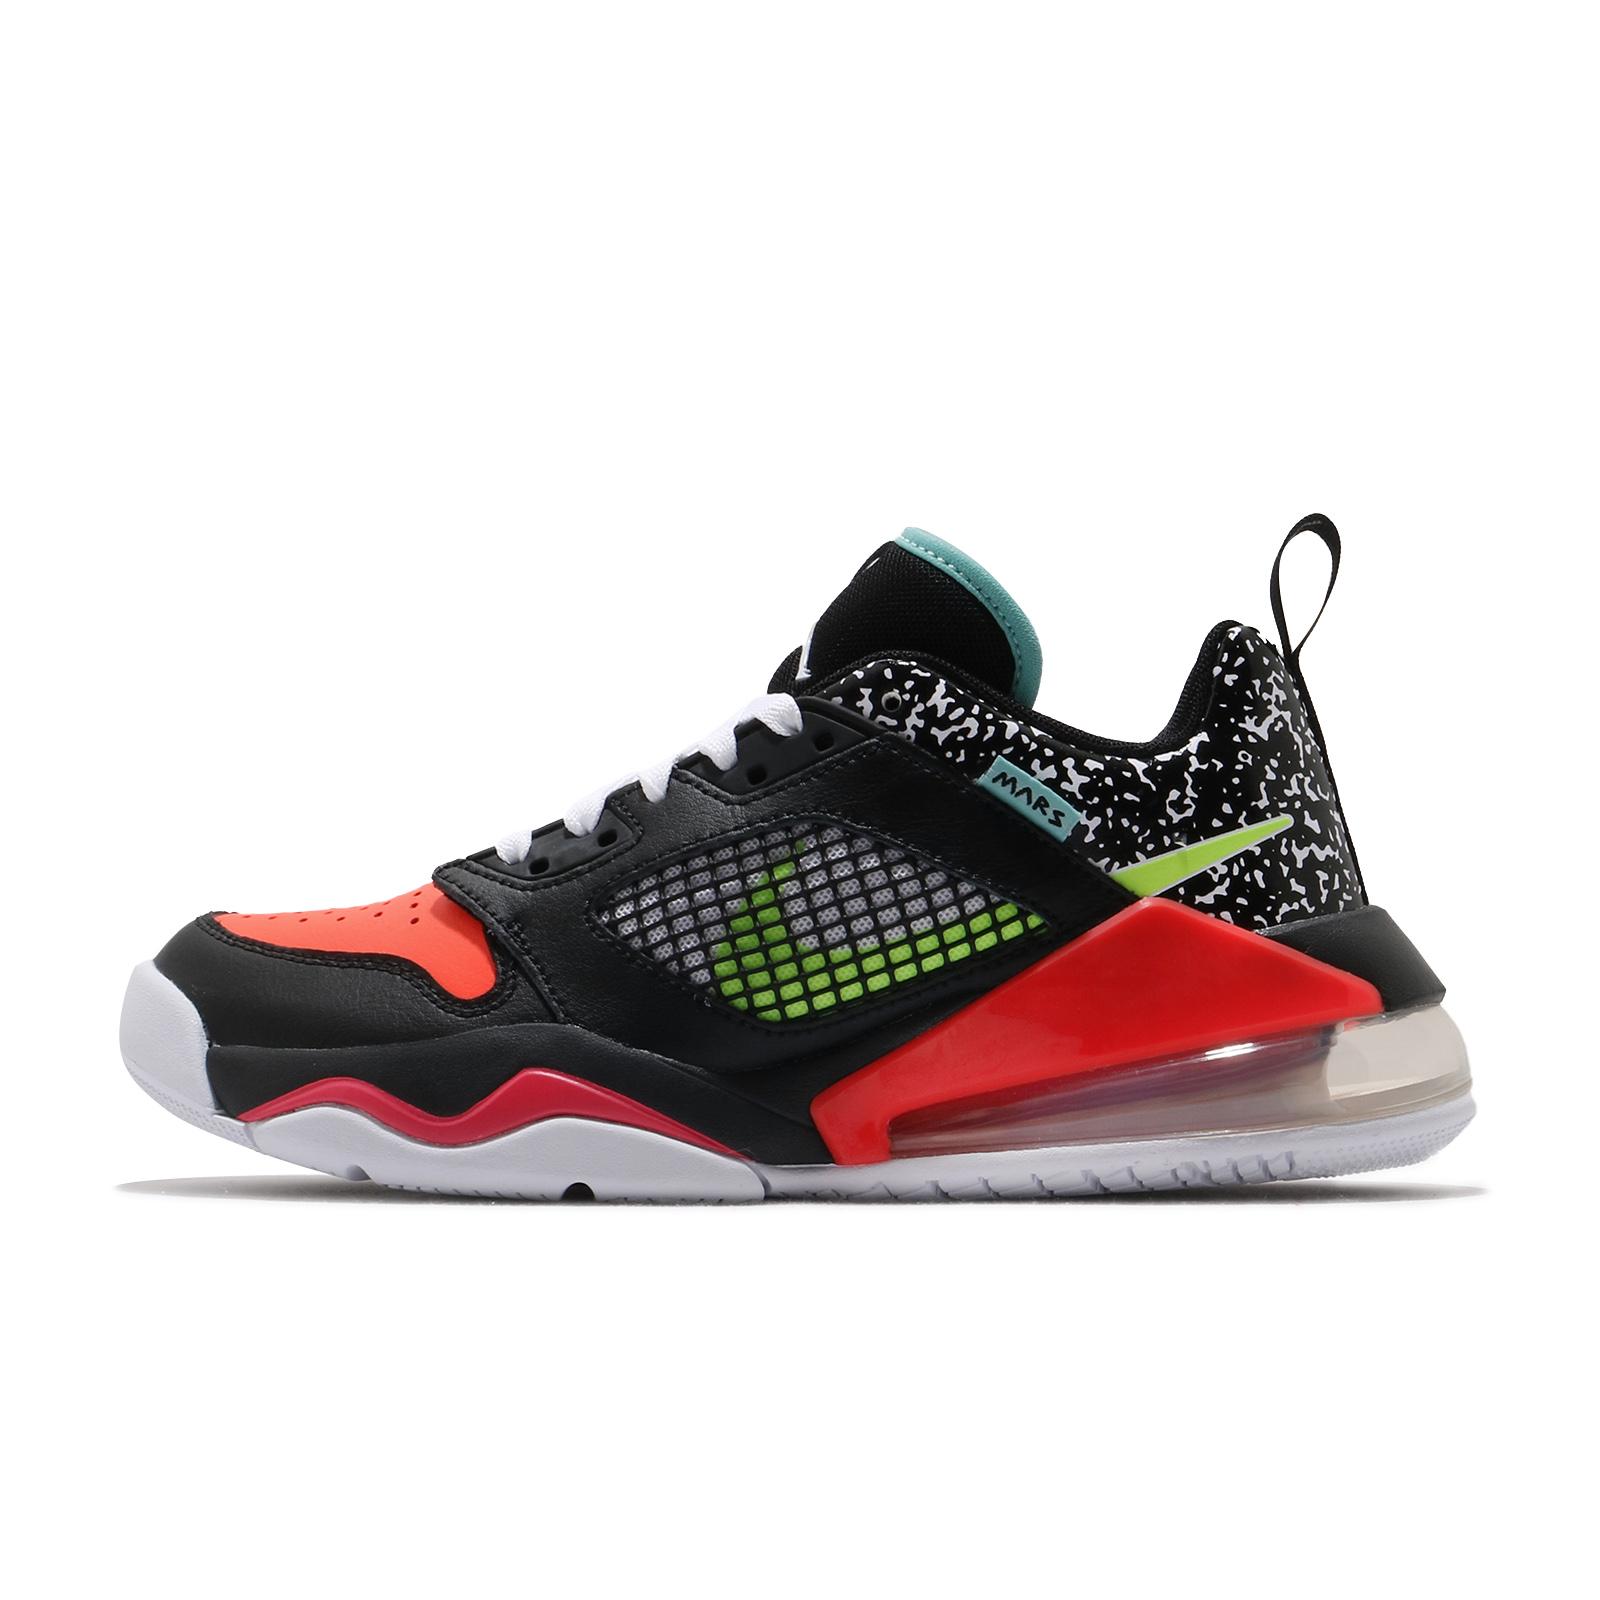 Nike 休閒鞋 Jordan Mars 270 Low GS 黑 紅 氣墊 喬丹 女鞋【ACS】 CK2504-078